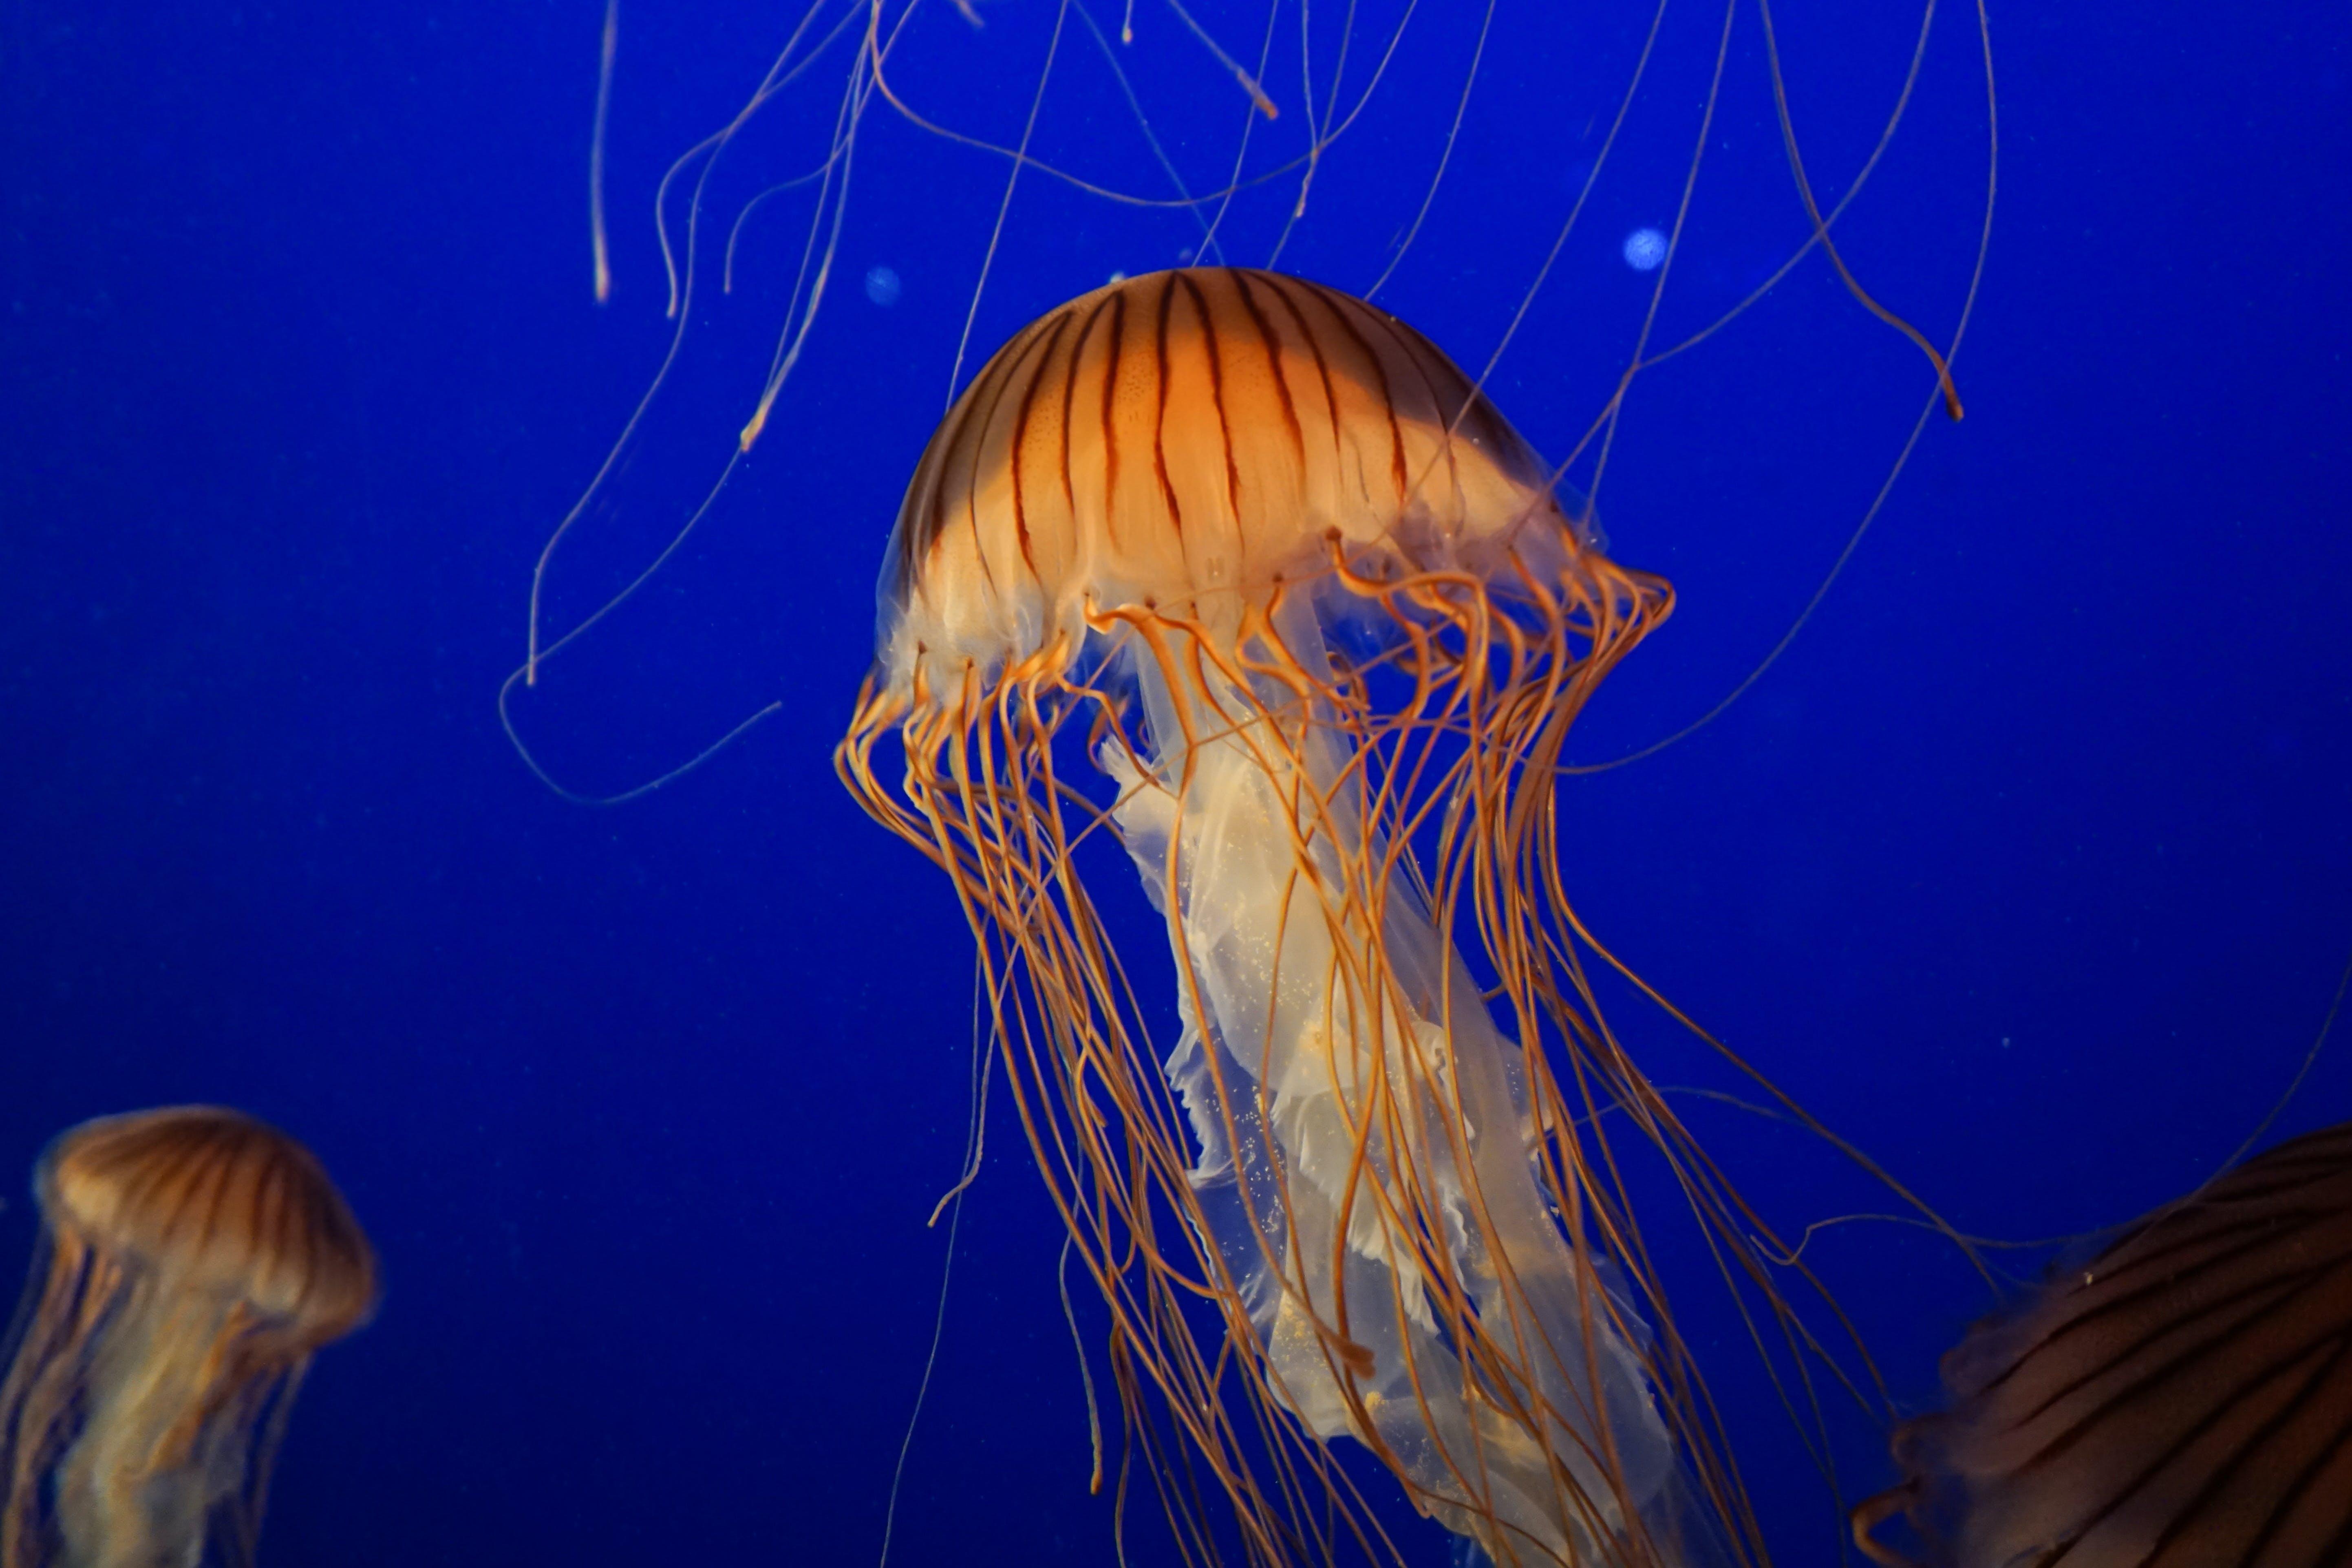 aquarium, jellyfish, marine life